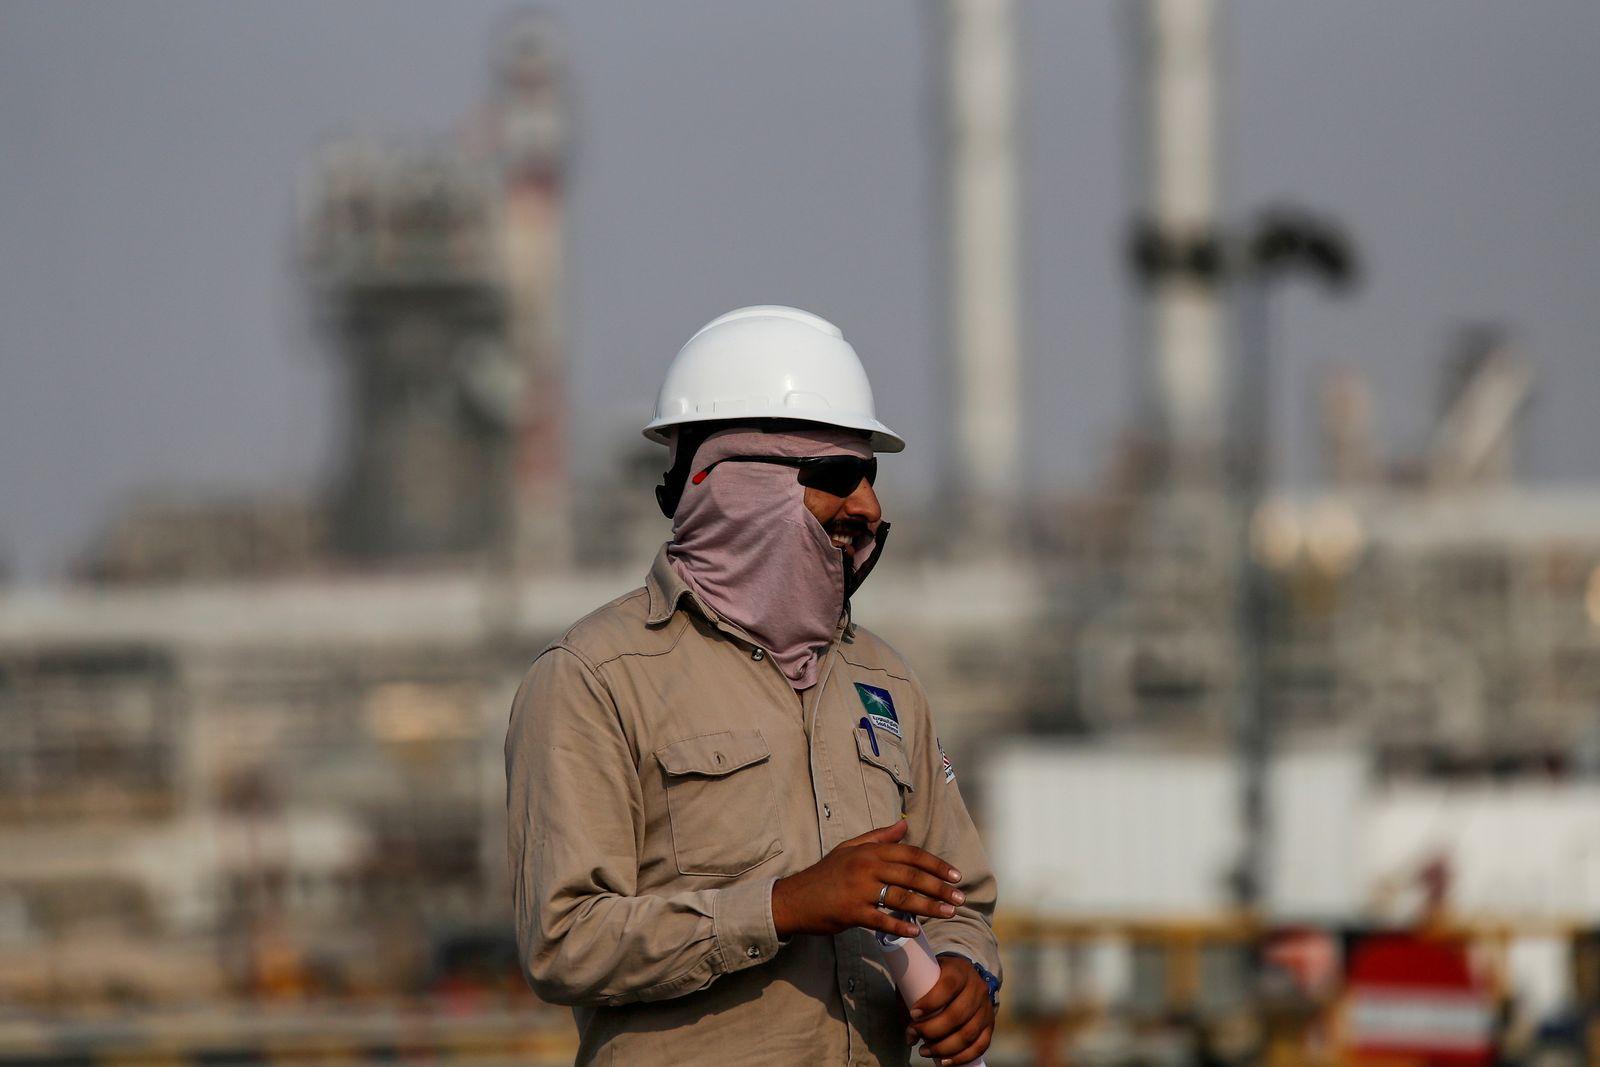 FILE PHOTO: An employee looks on at Saudi Aramco oil facility in Abqaiq